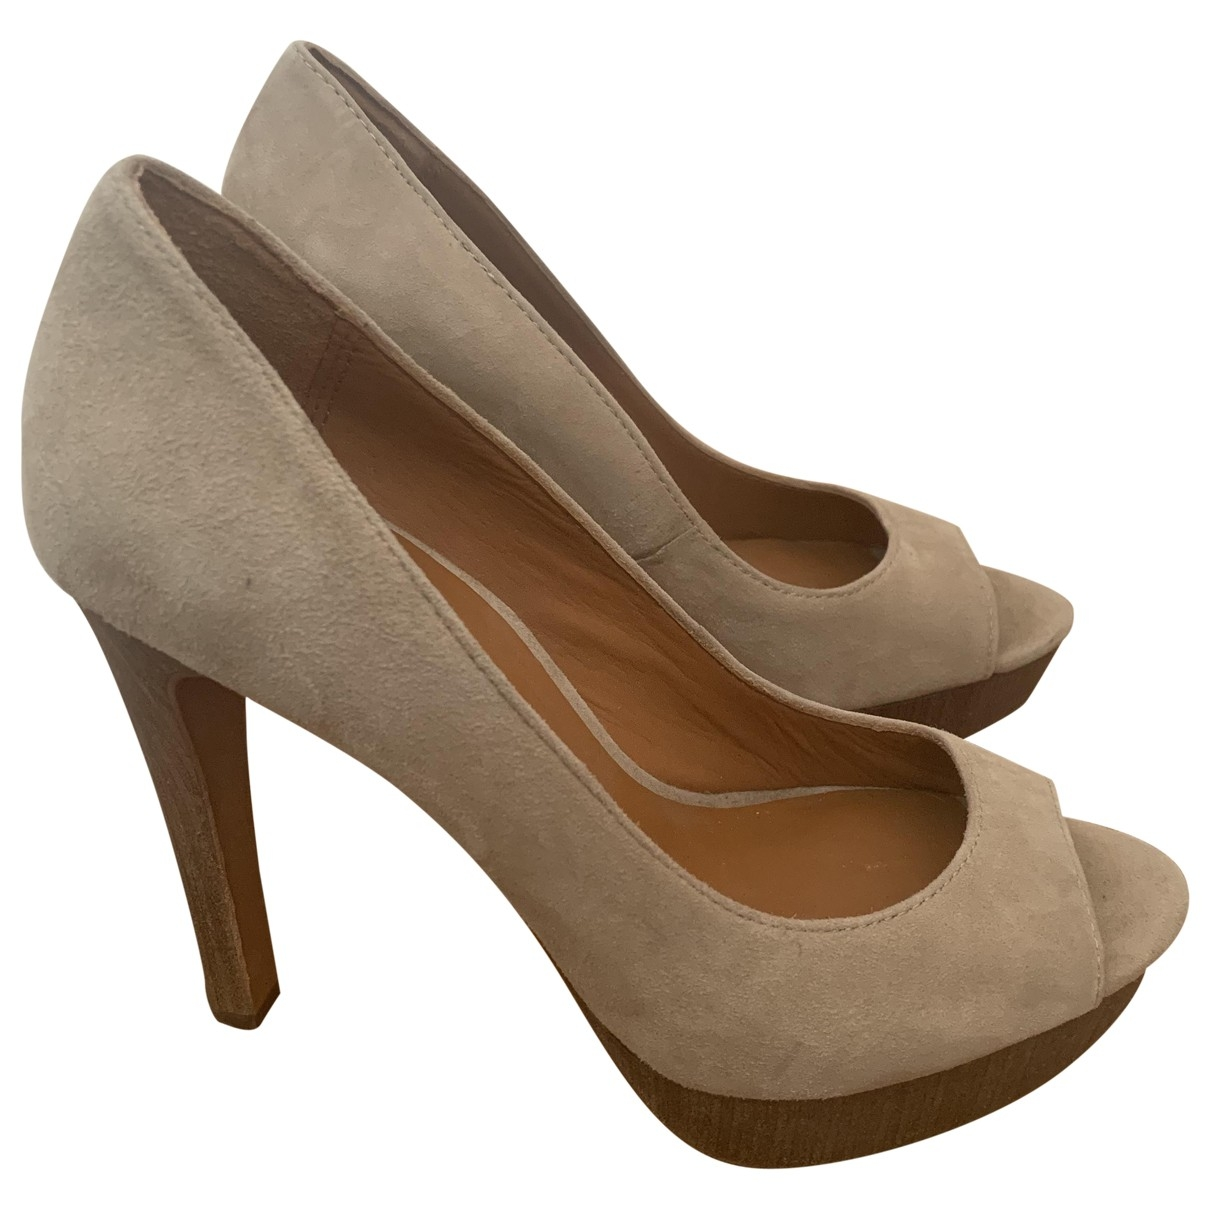 Ash \N Beige Suede Sandals for Women 37 EU